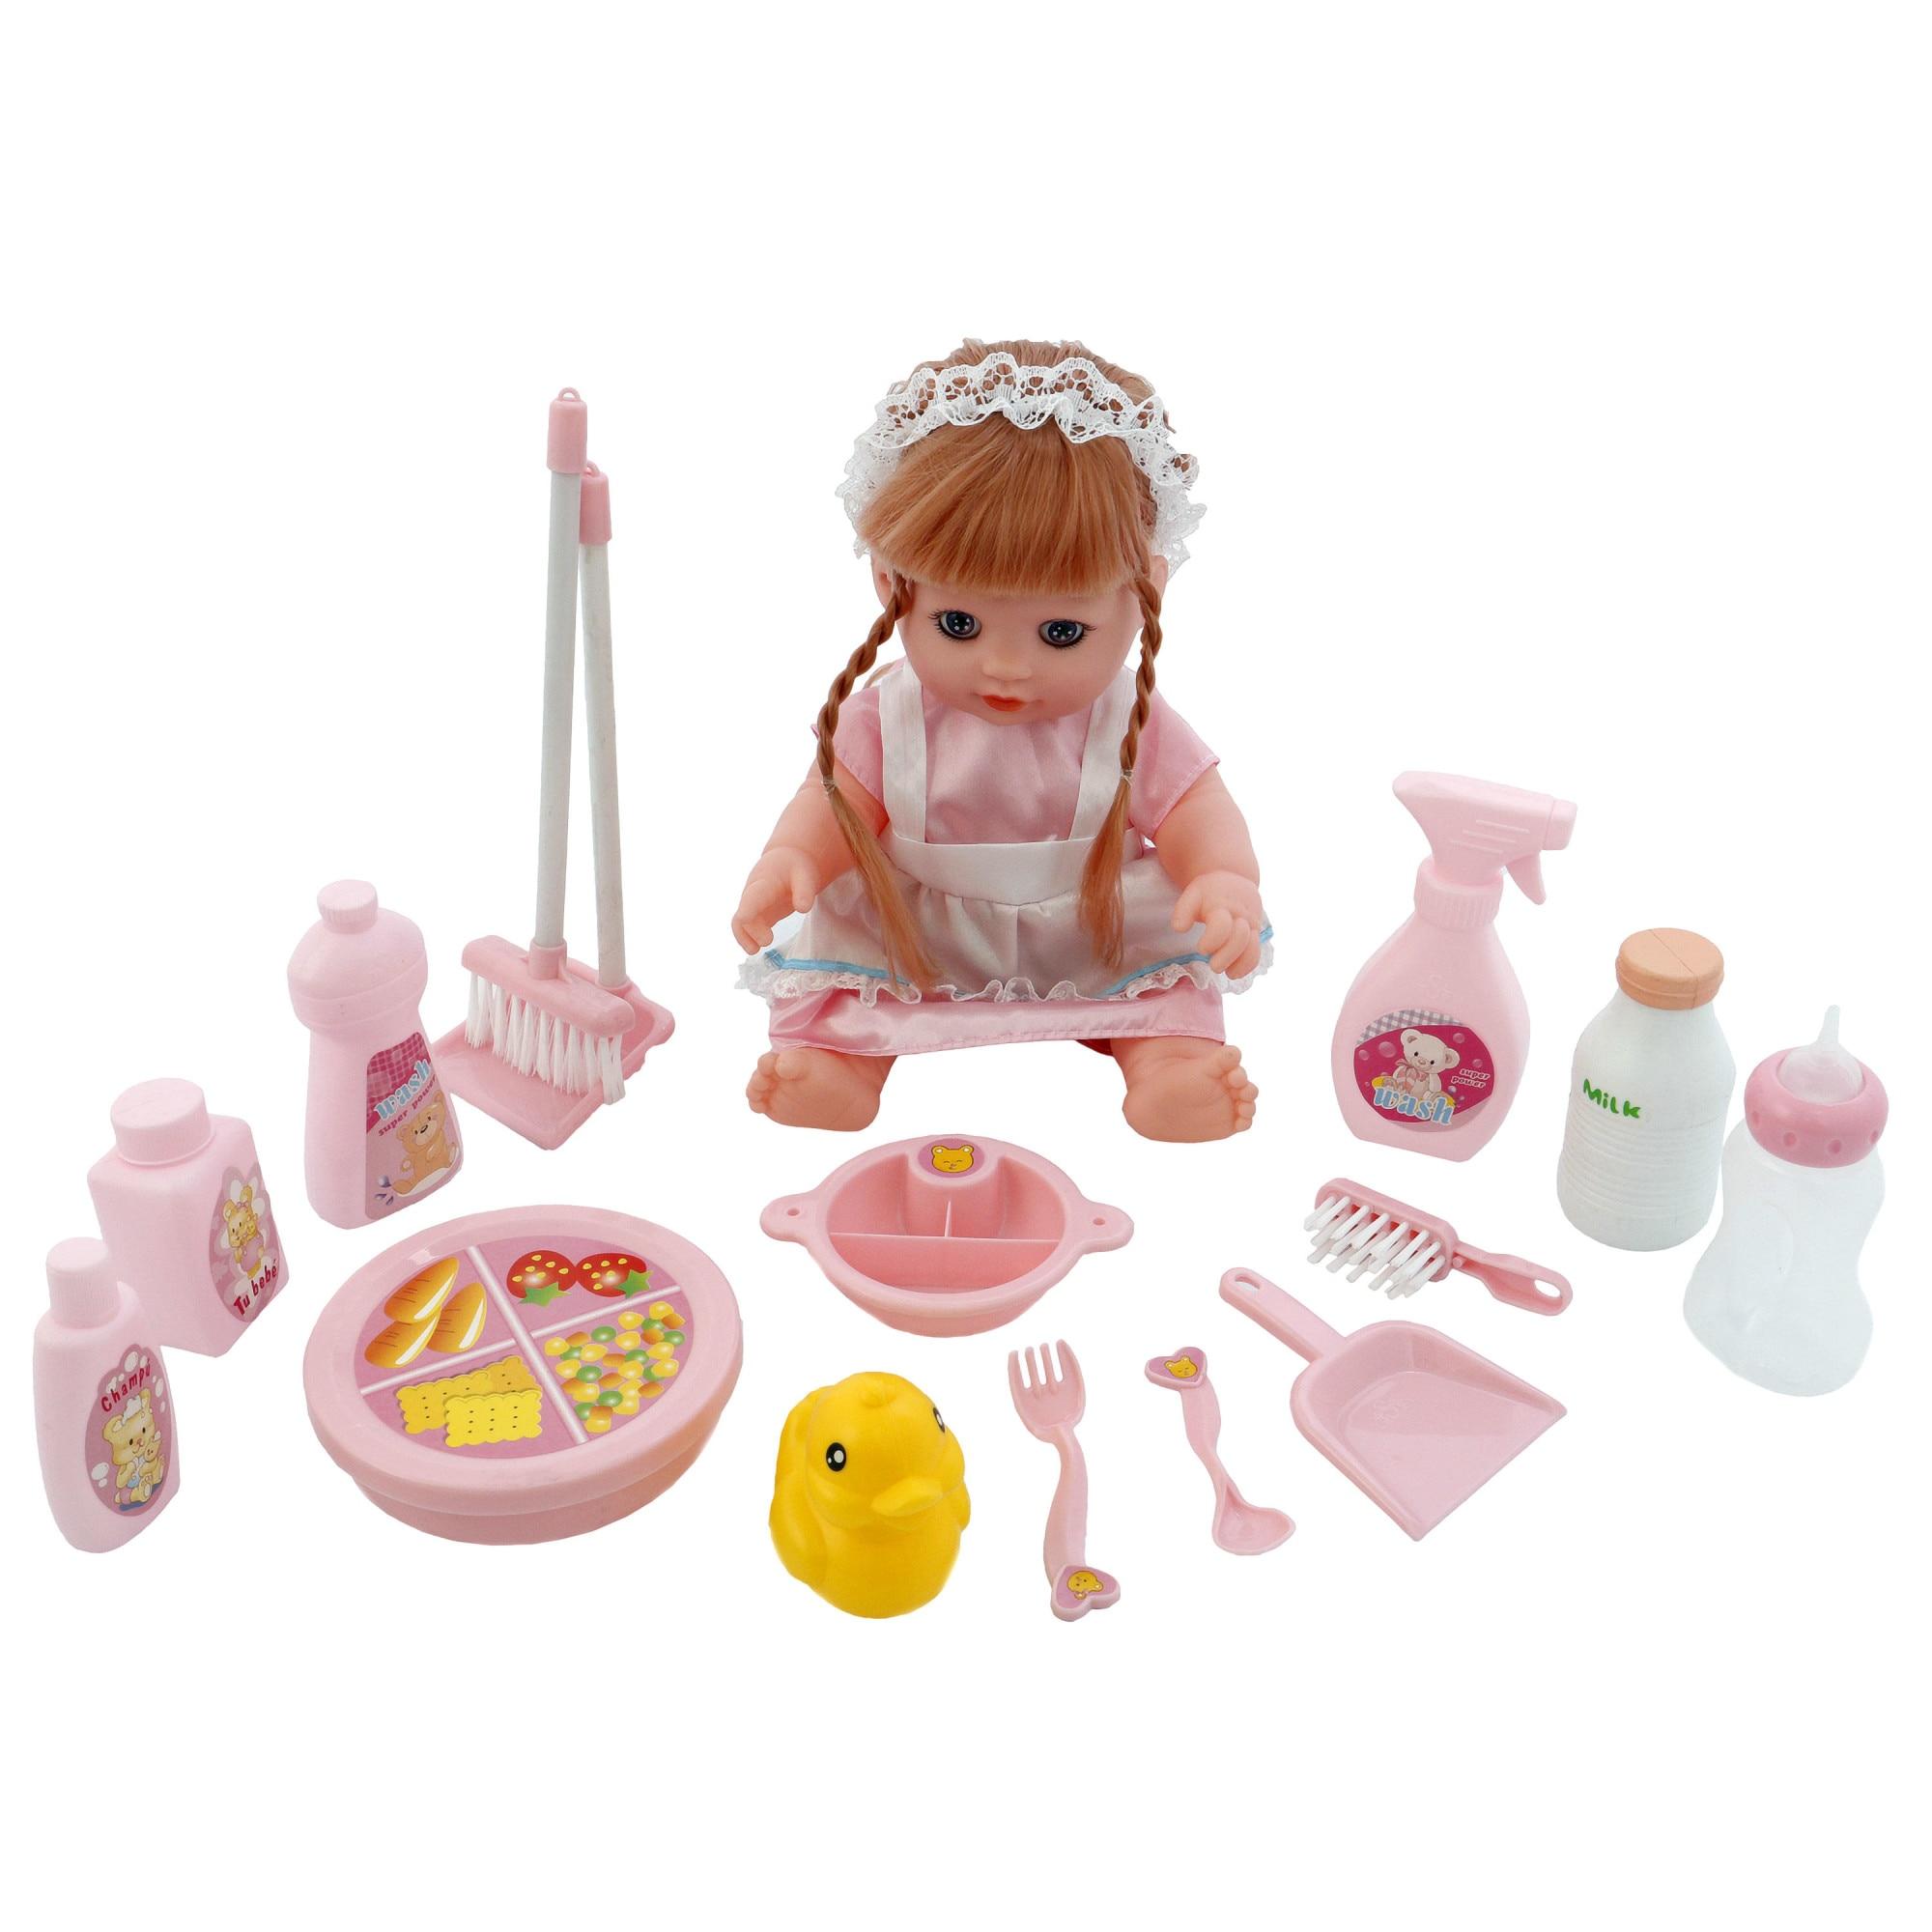 Fotografie Papusa M-Toys Aurora cu functii si accesorii, 35 cm